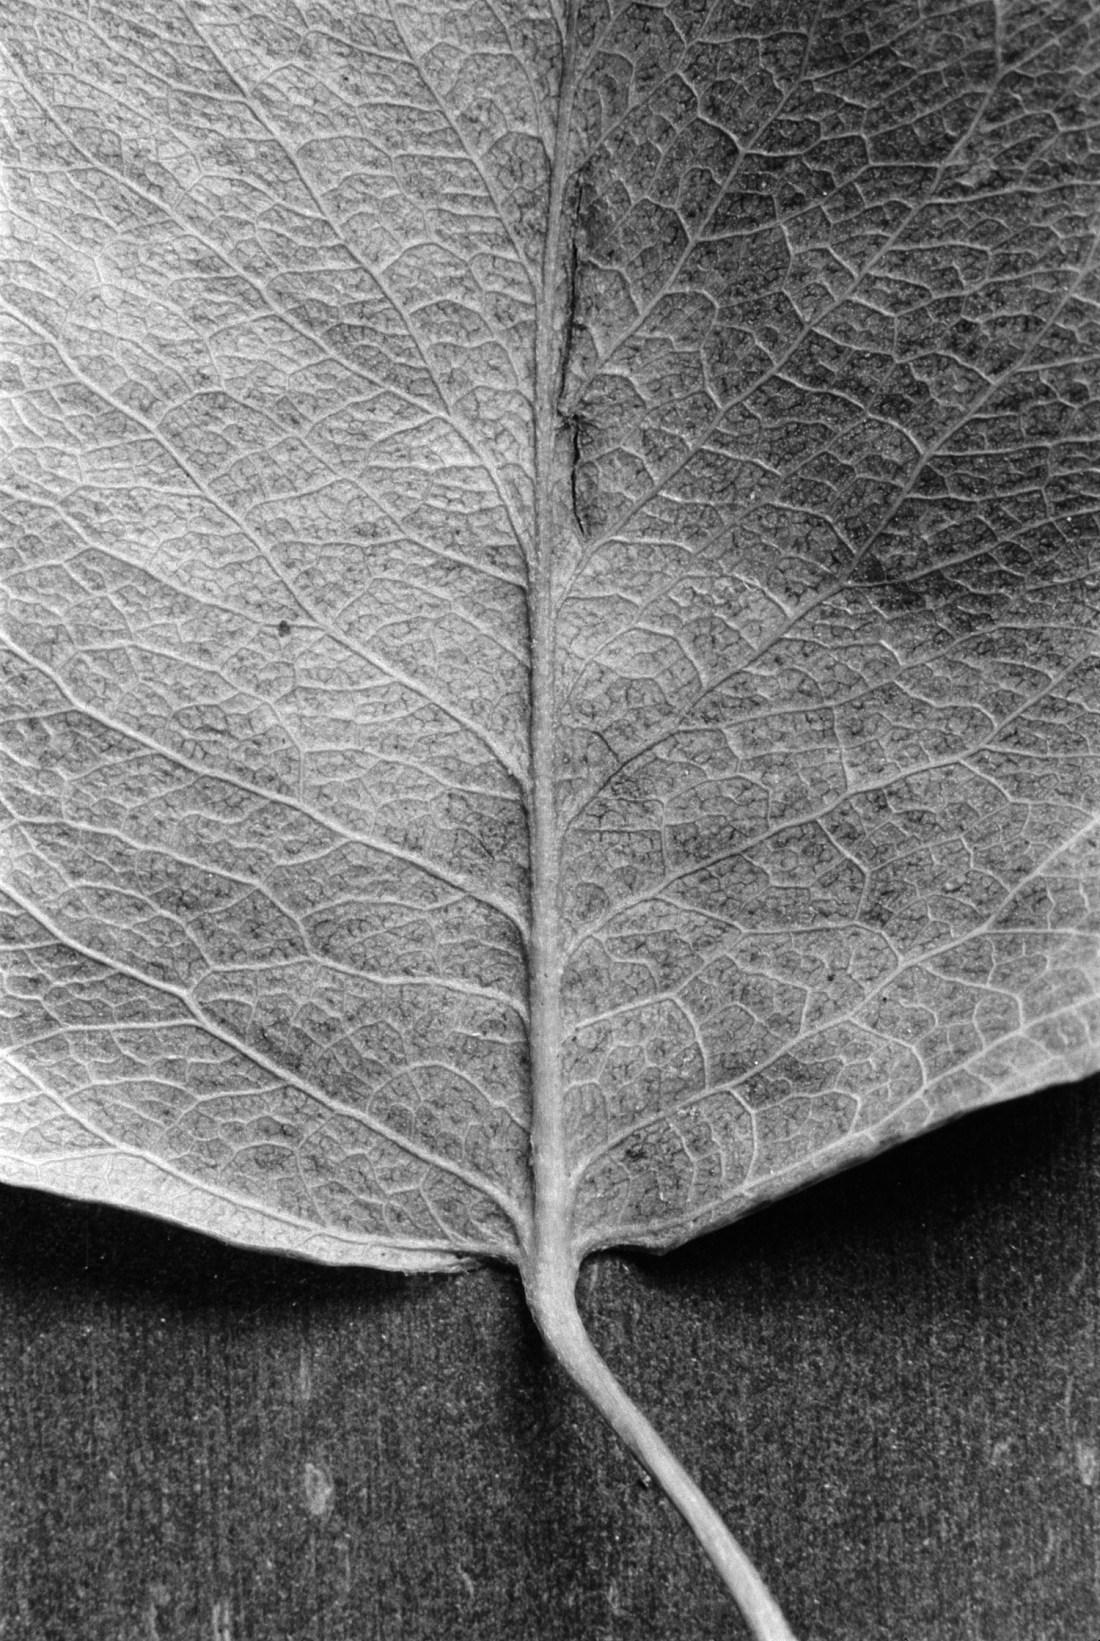 Still Life: Leaf Macro